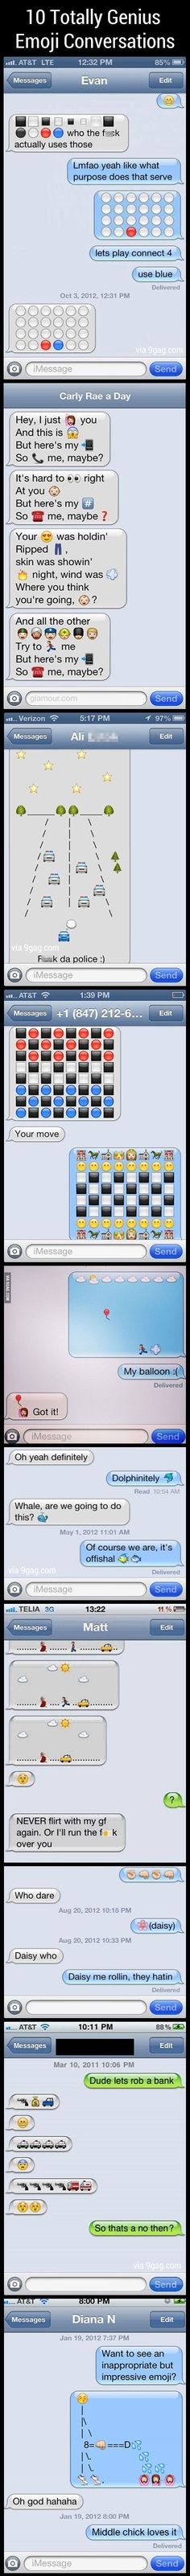 10 Totally Genius Emoji Conversations: